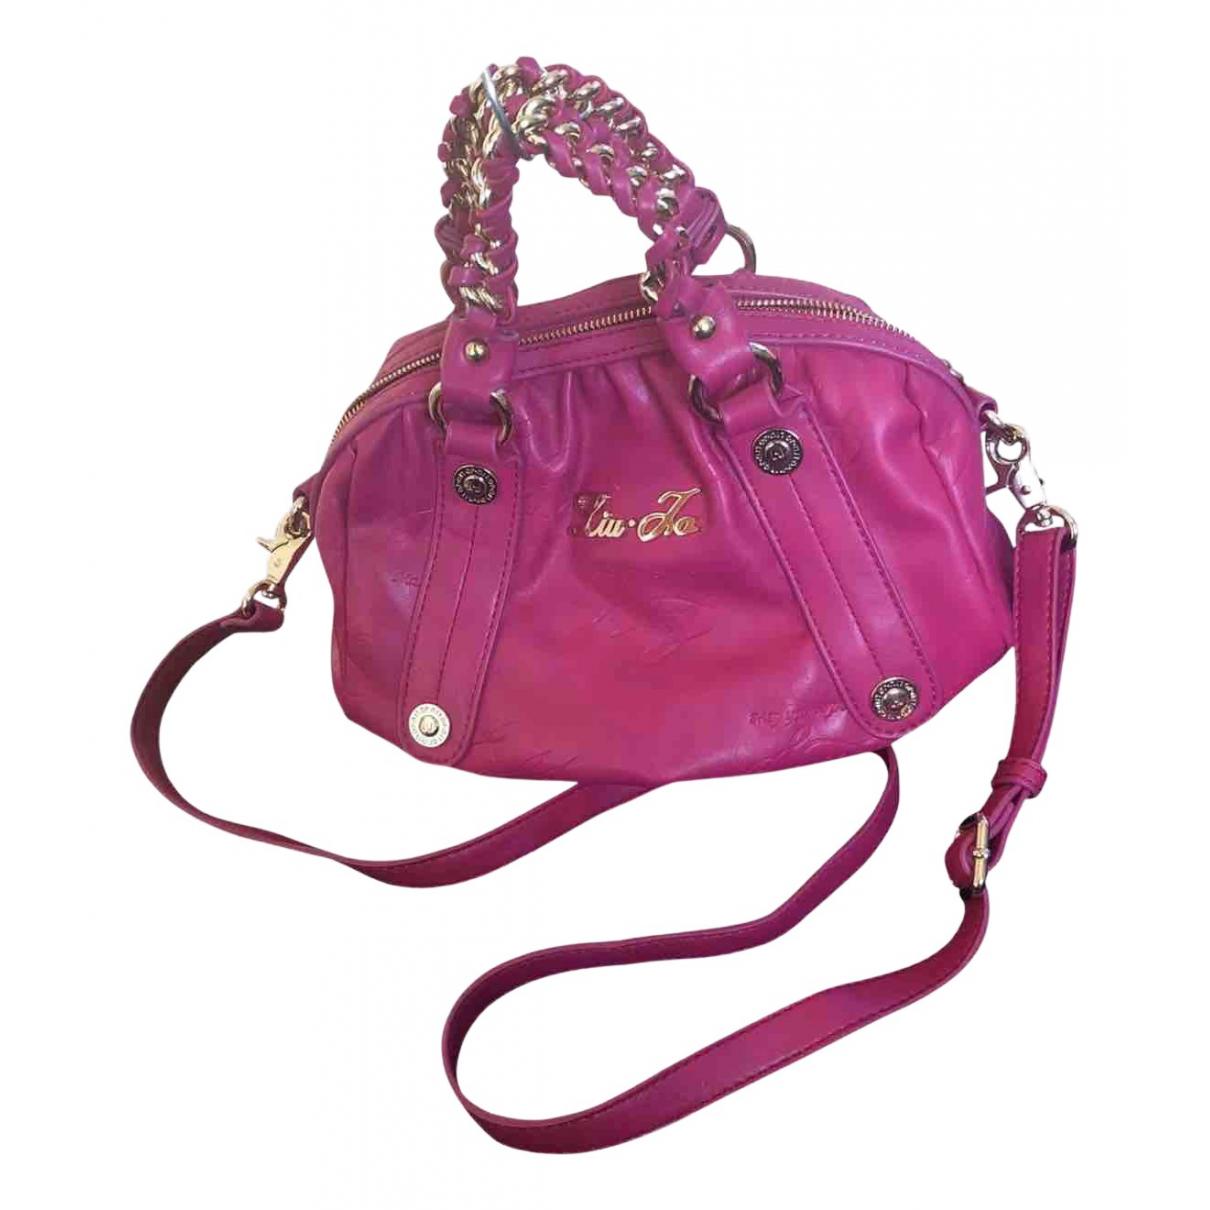 Liu.jo N Pink Leather handbag for Women N